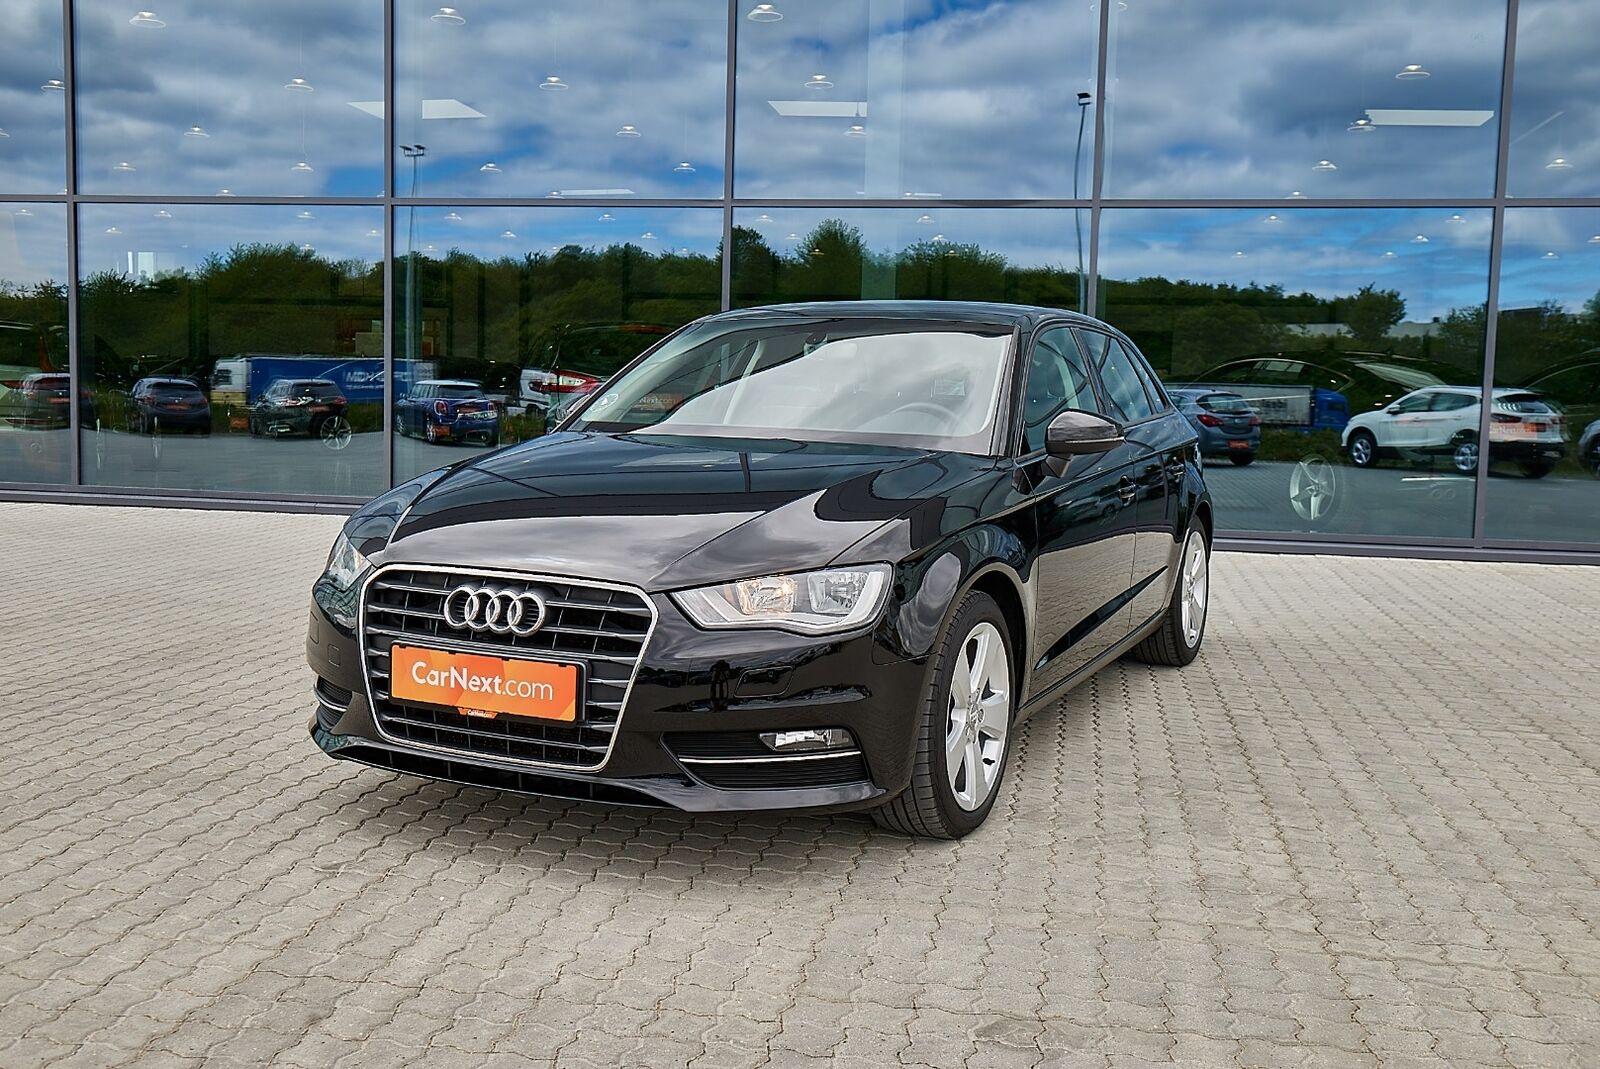 Audi A3 2,0 TDi 150 Ambition SB S-tr. 5d - 209.900 kr.